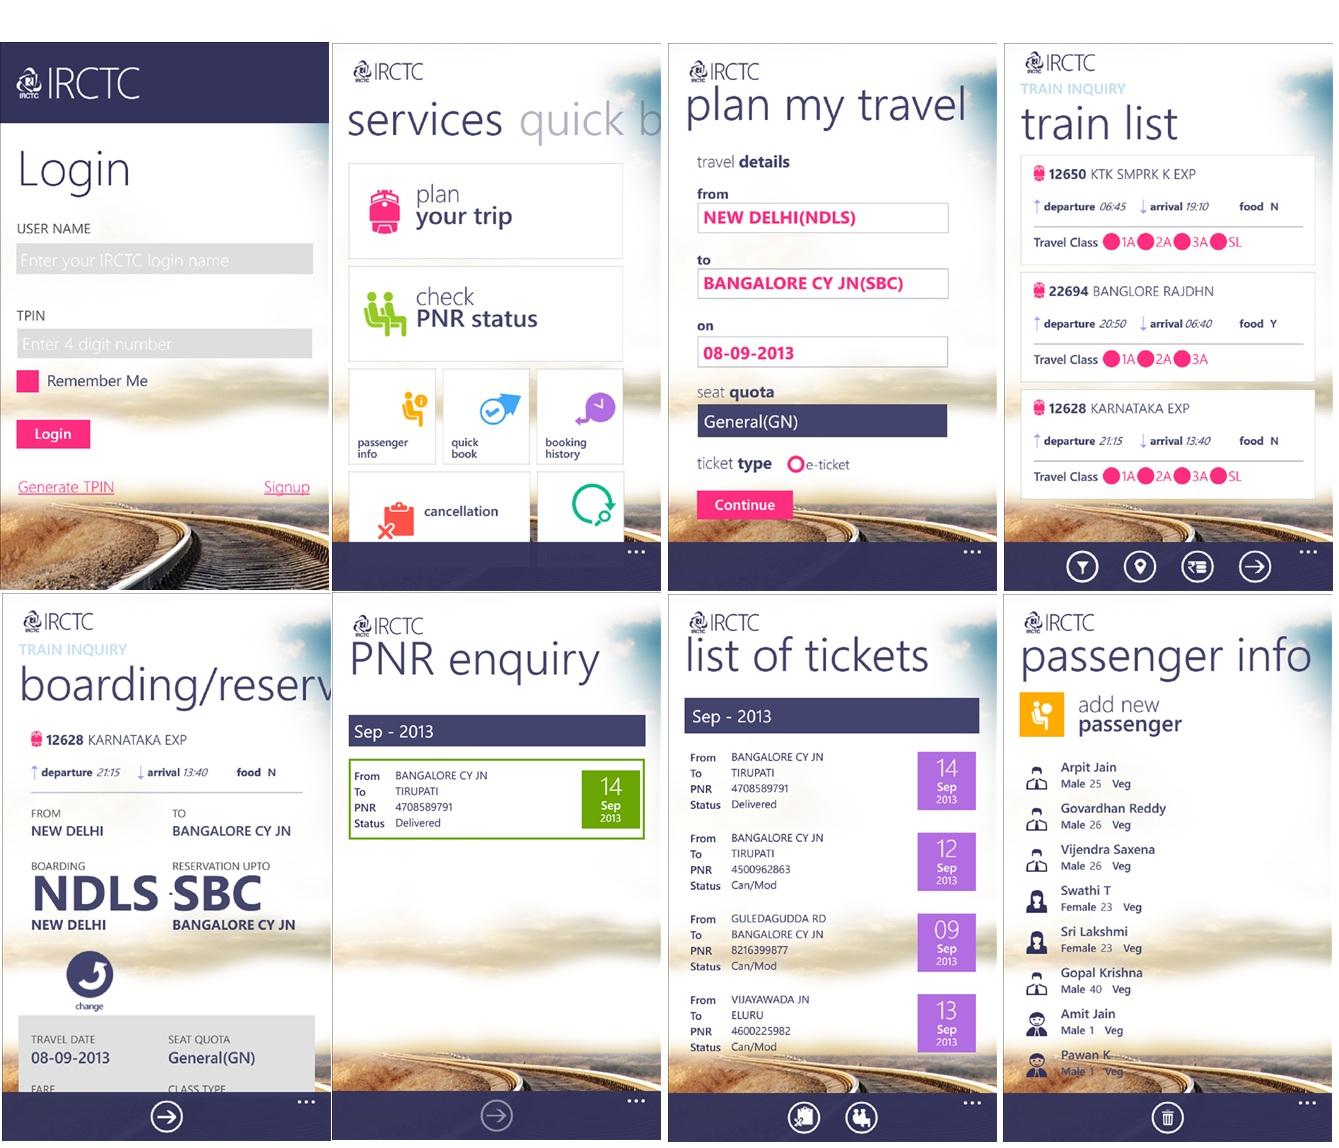 IRCTC Windows Phone App